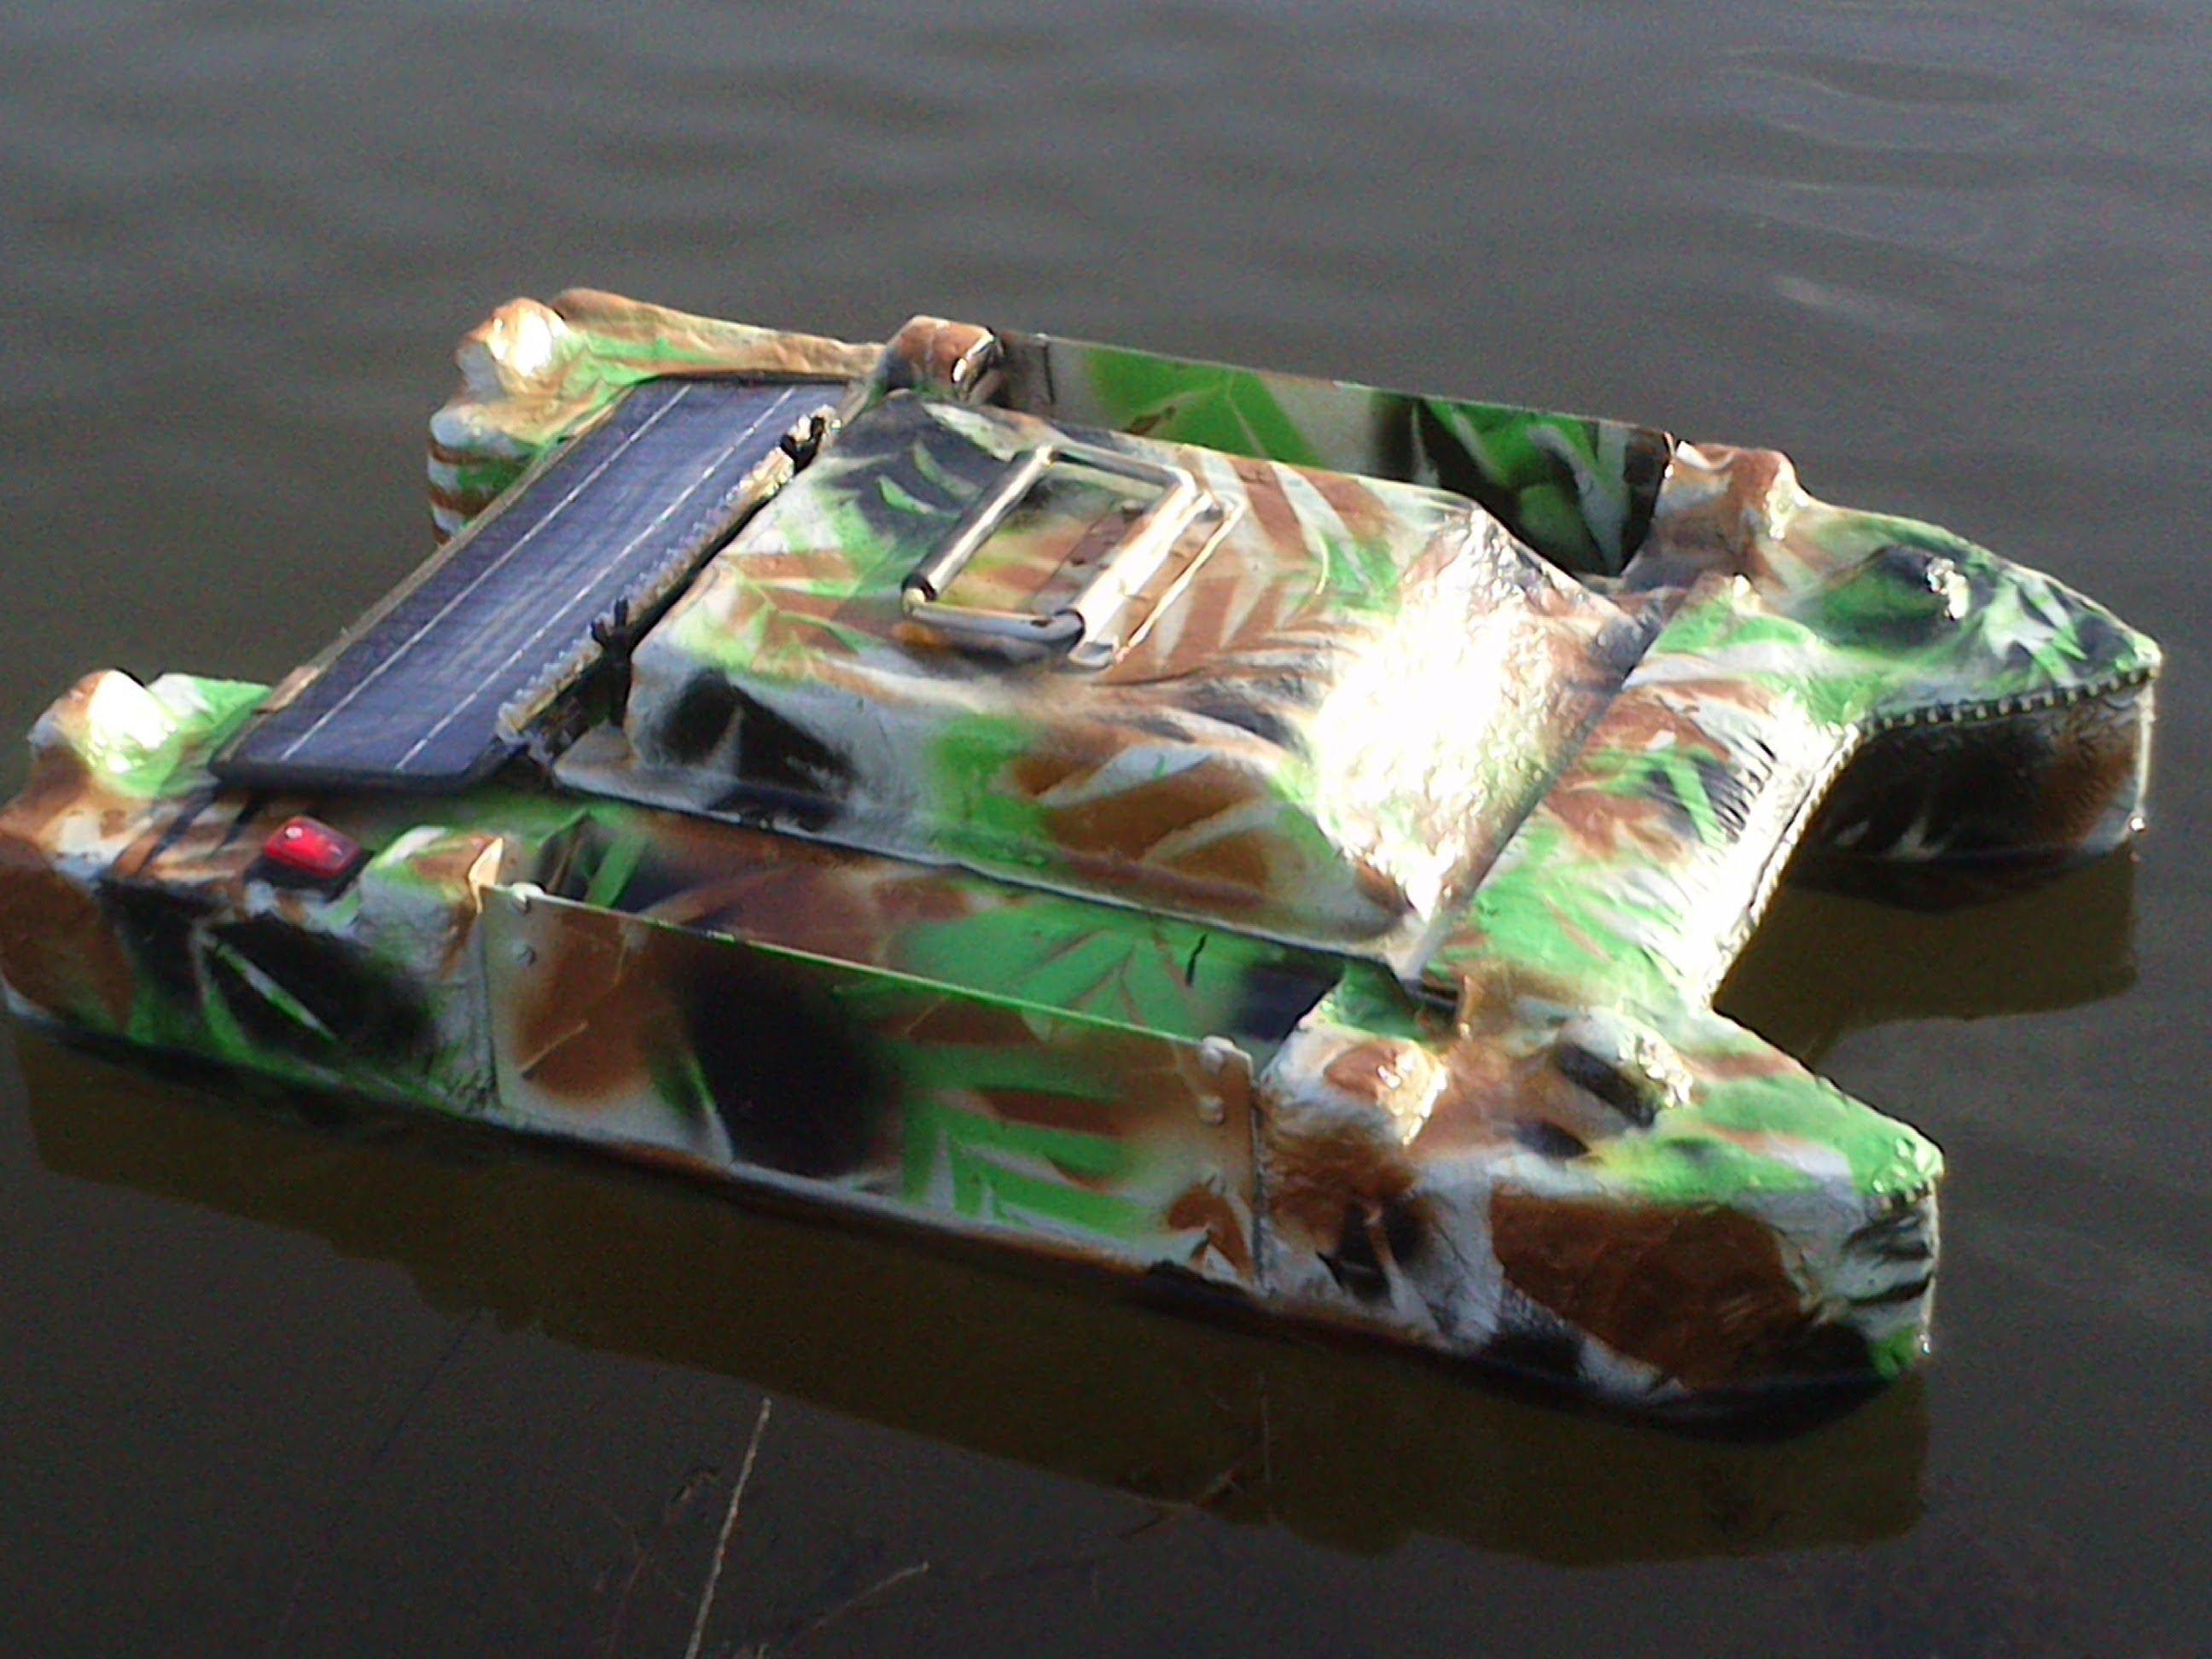 bateau amorceur fabrication artisanale